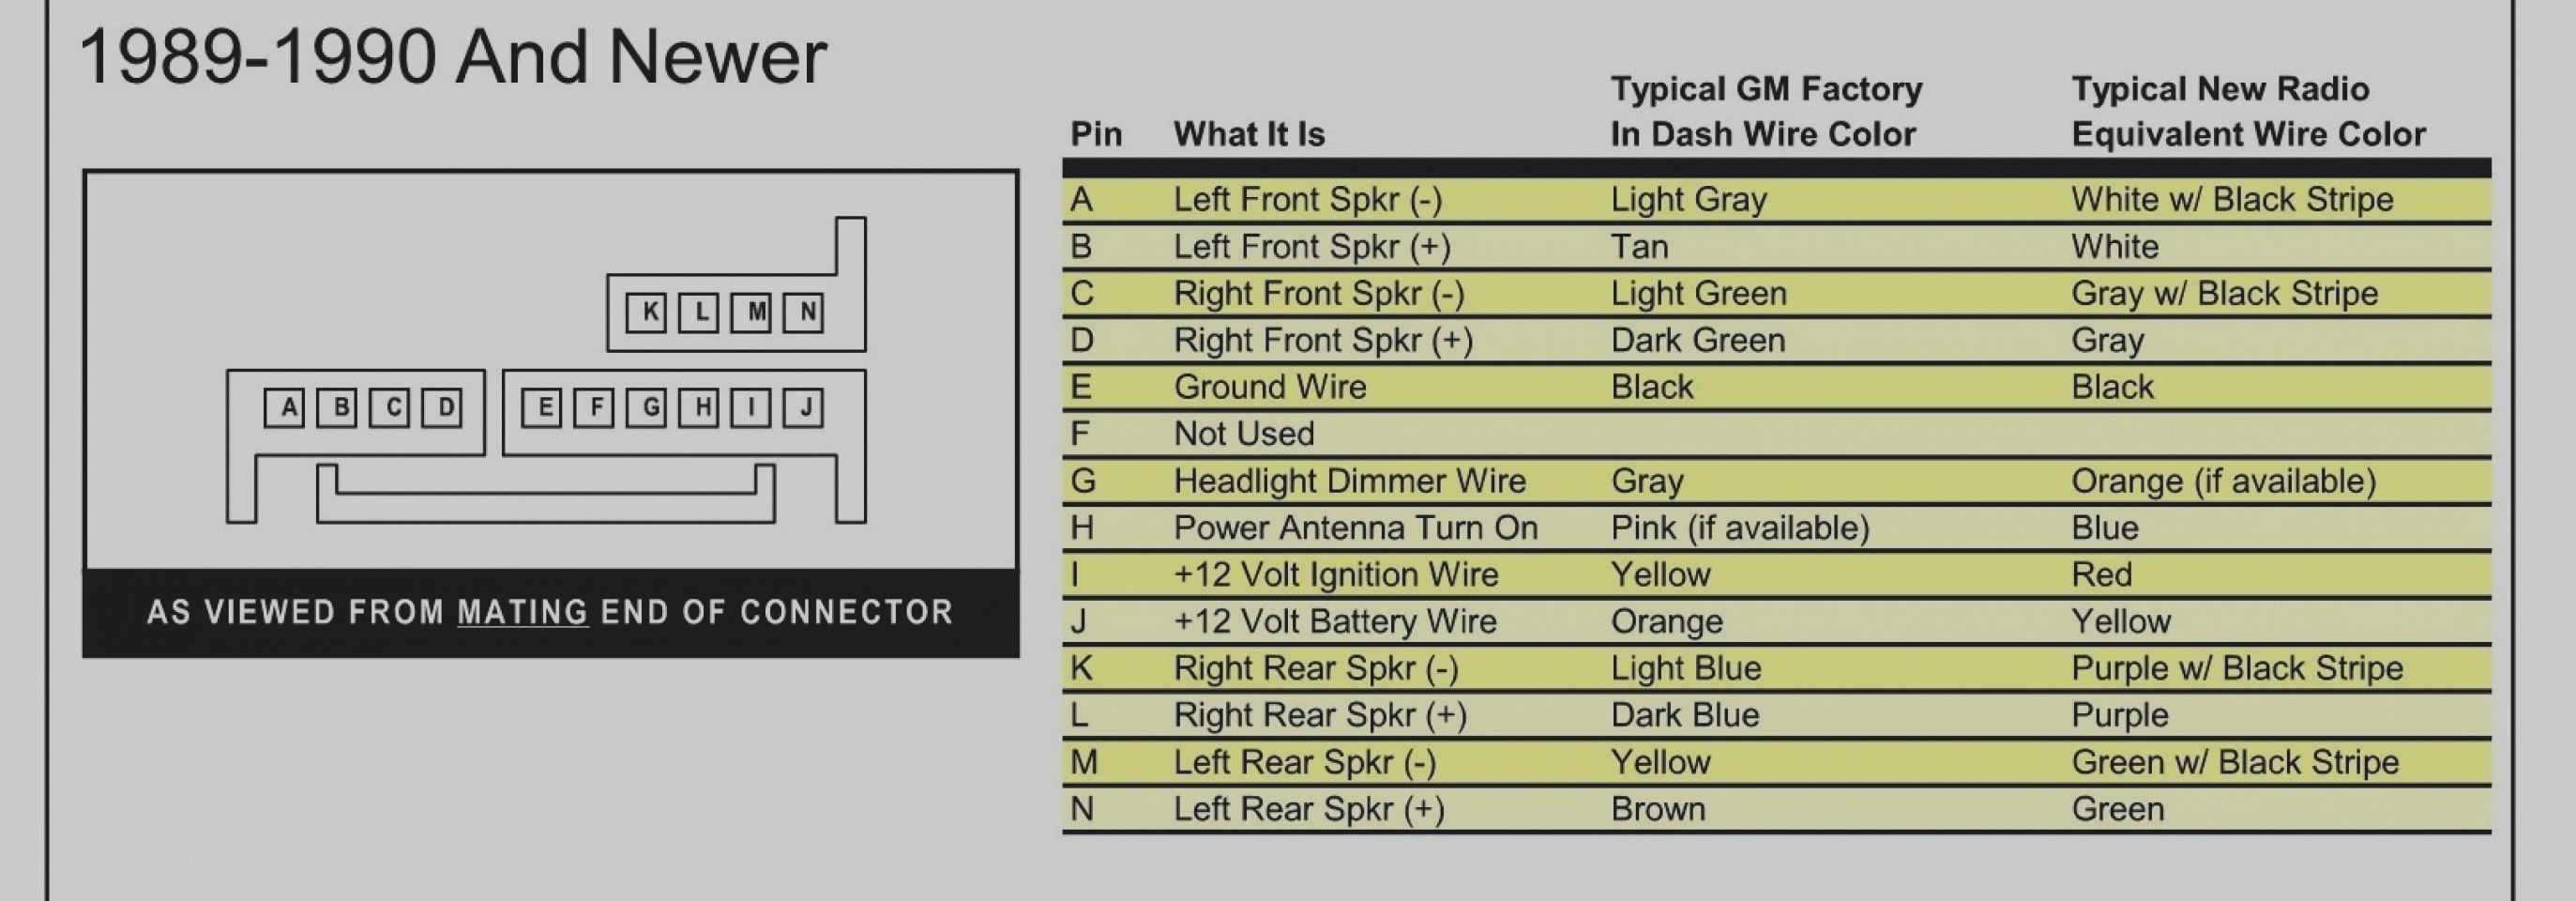 [ANLQ_8698]  SA_0012] 1998 Chevrolet C1500 Wiring Diagram Wiring Diagram | 1998 Suburban Wiring Diagram |  | Stic Exxlu Olyti Over Pala Ophag Inkl Props Omit Nekout Expe Nnigh Benkeme  Mohammedshrine Librar Wiring 101